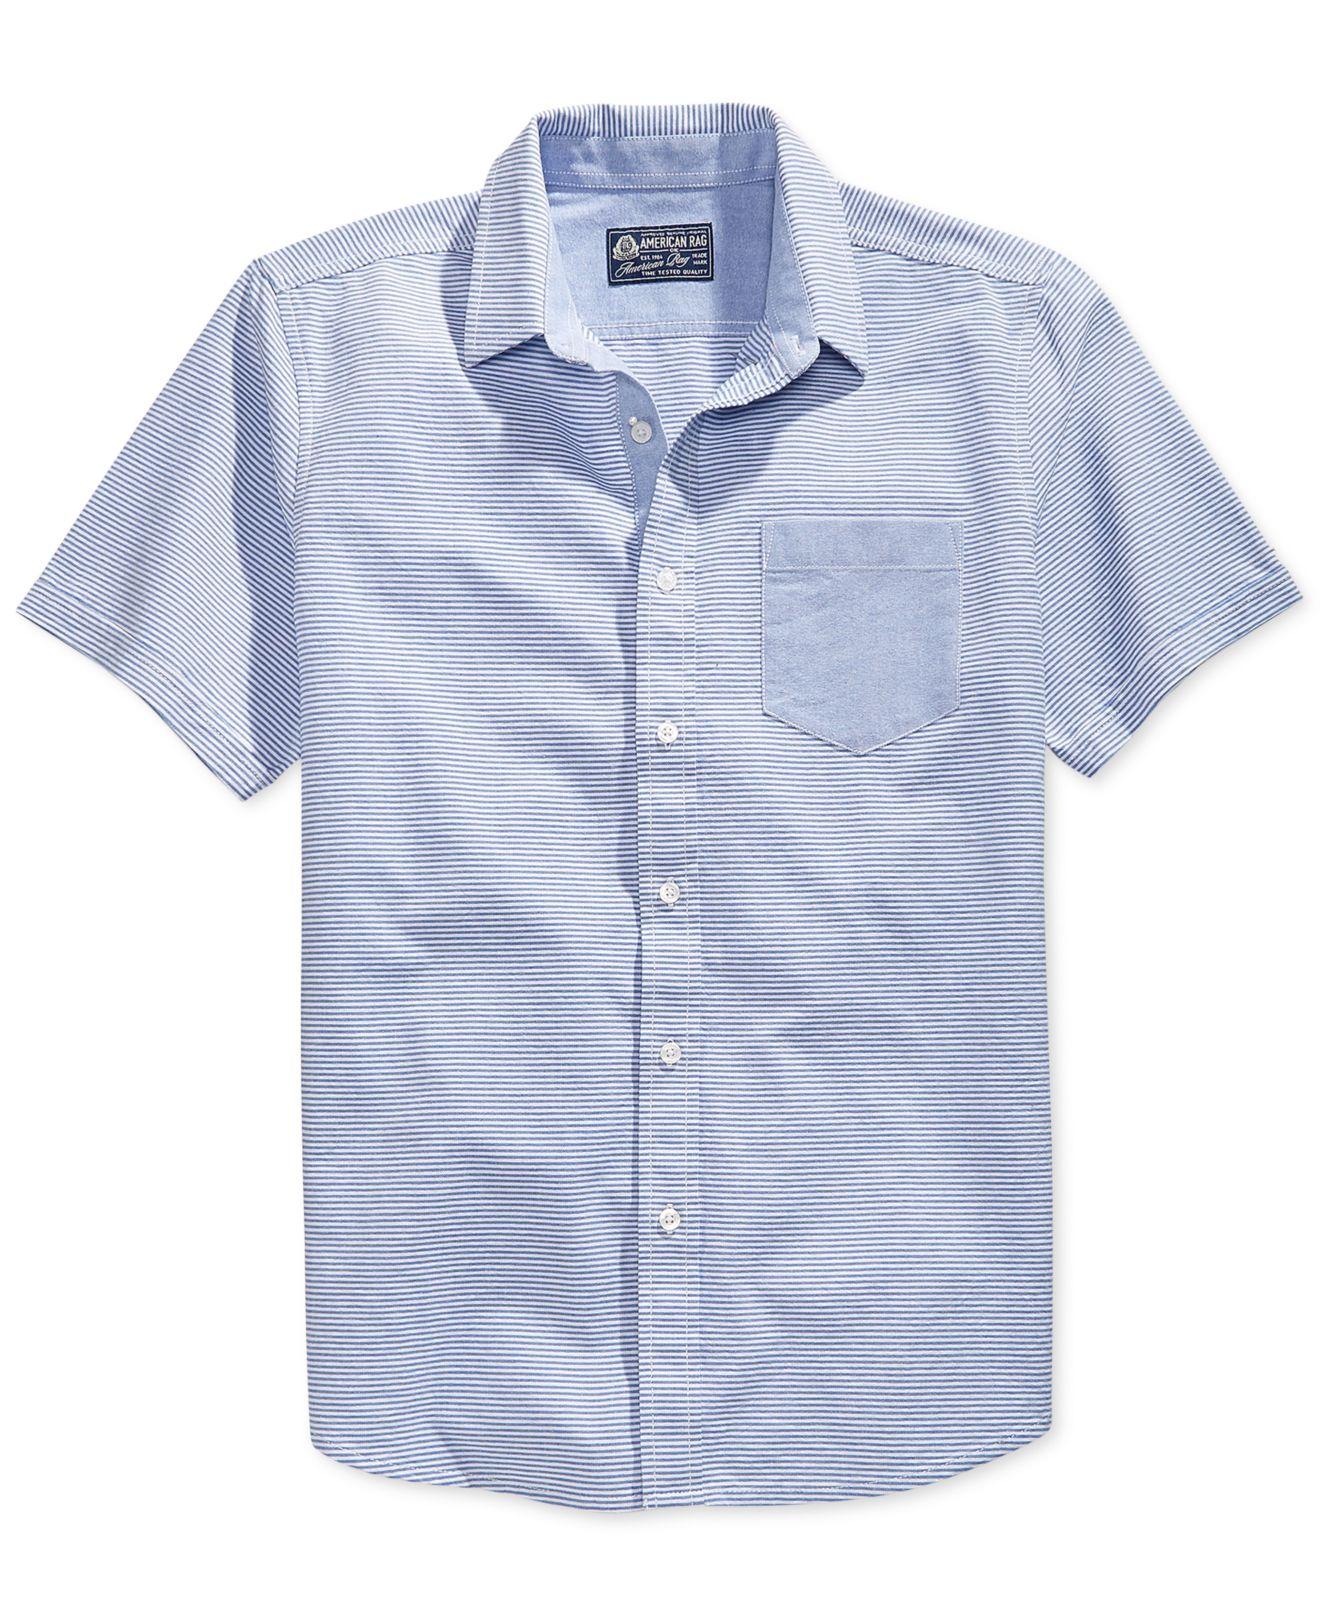 Lyst American Rag Horizon Oxford Shirt In Blue For Men